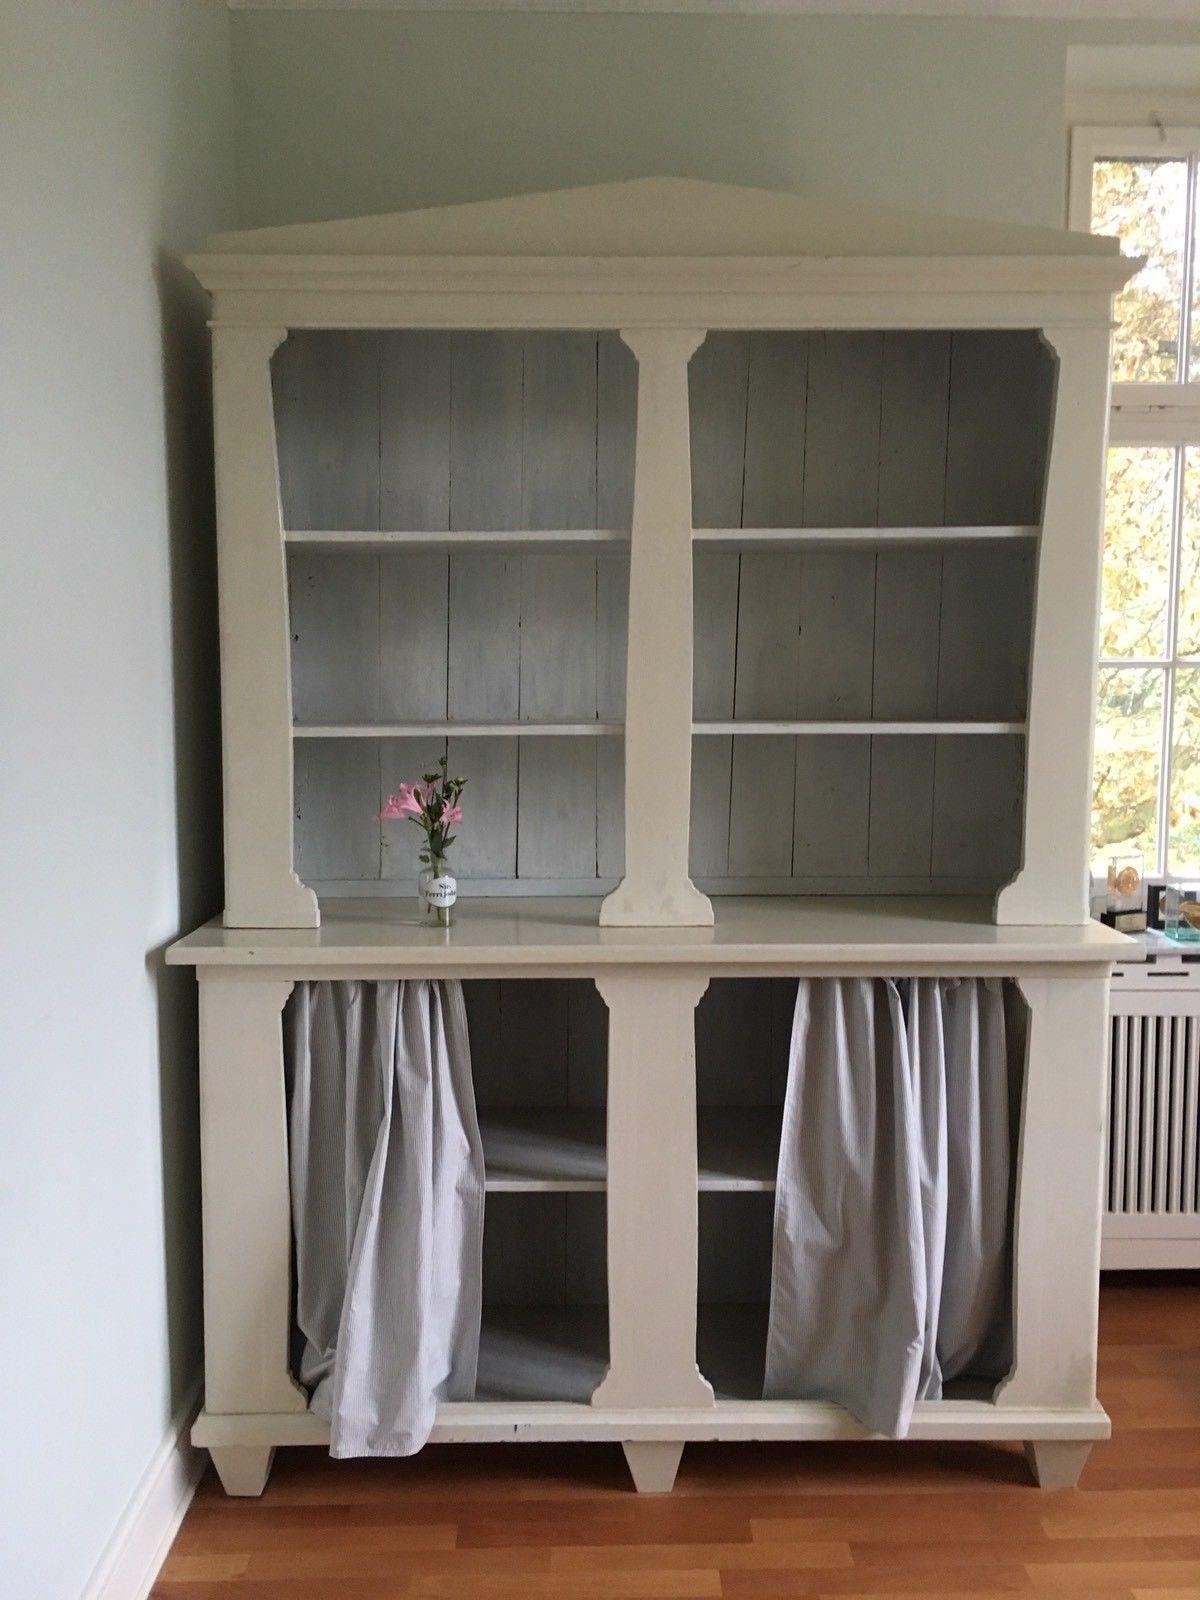 k chenschrank antik sideboard schrank wei gebeizt antiquit ten kunst mobiliar interieur. Black Bedroom Furniture Sets. Home Design Ideas